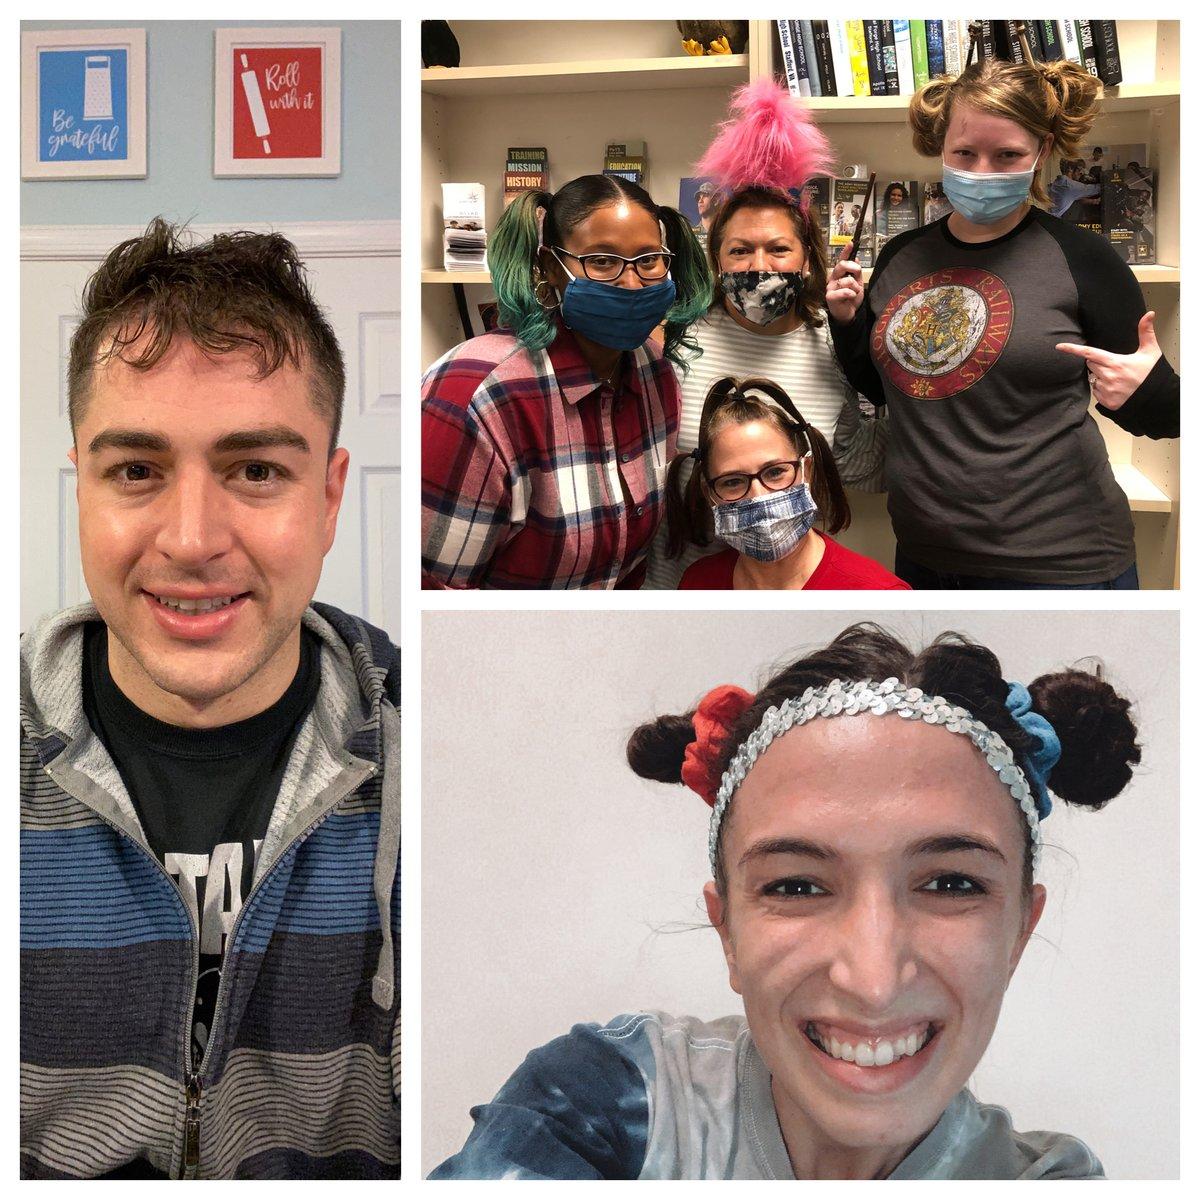 CFHS Crazy Hair Counselors celebrating Spirit Week~ @CForgeEagles @ForgeAthletics @greenwall2021  #weirdhairdontcare https://t.co/QFS13sJeb0